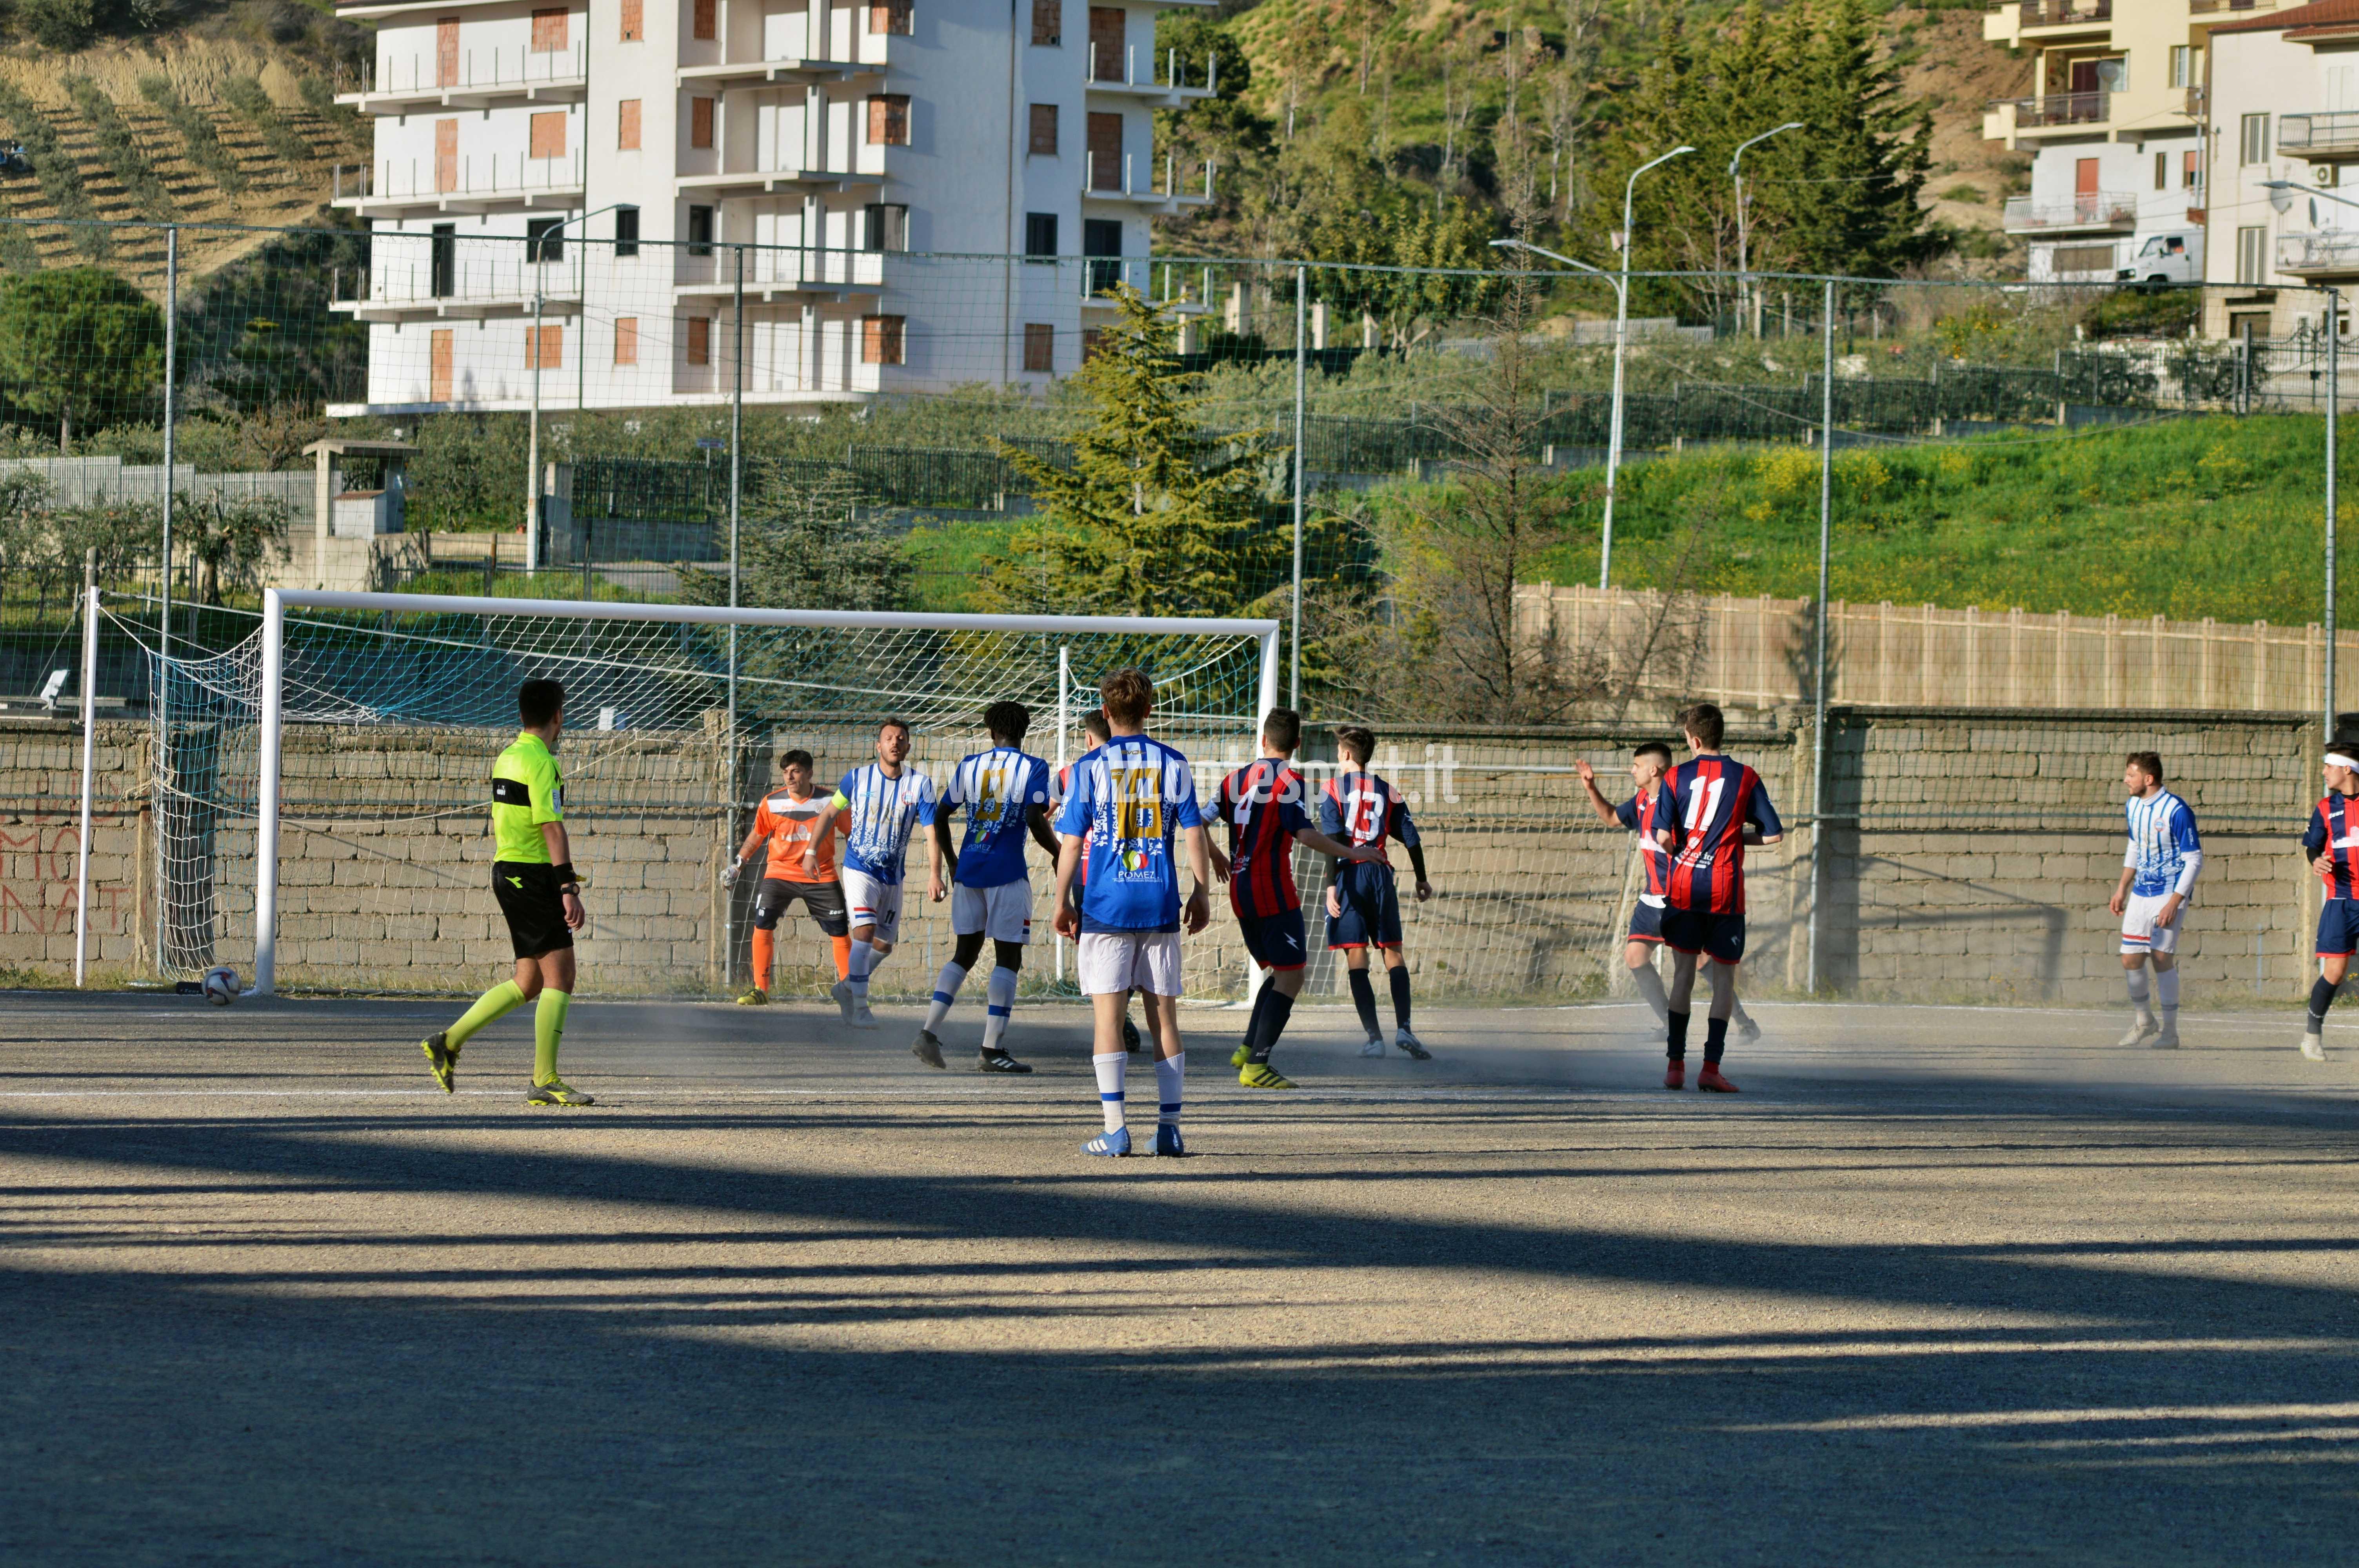 cassano_rossanese (174)